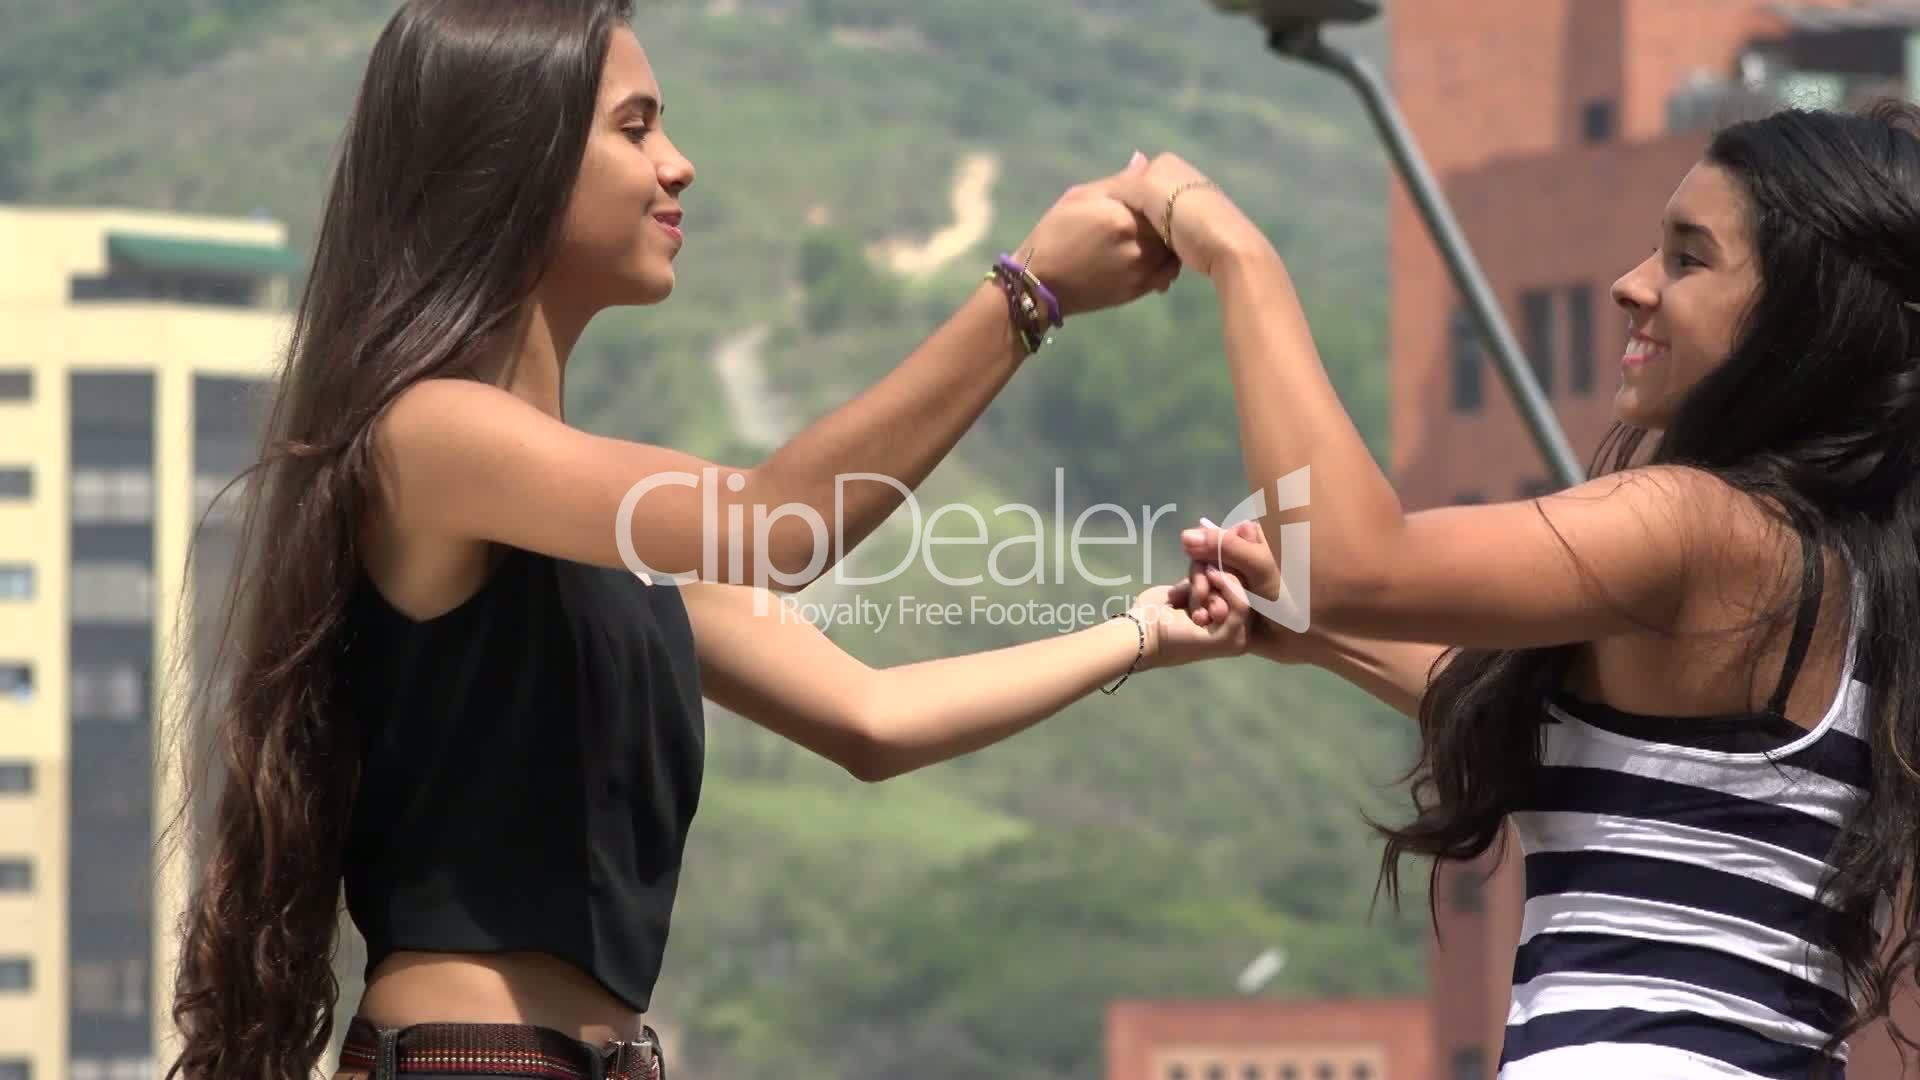 Free squrting pissing women